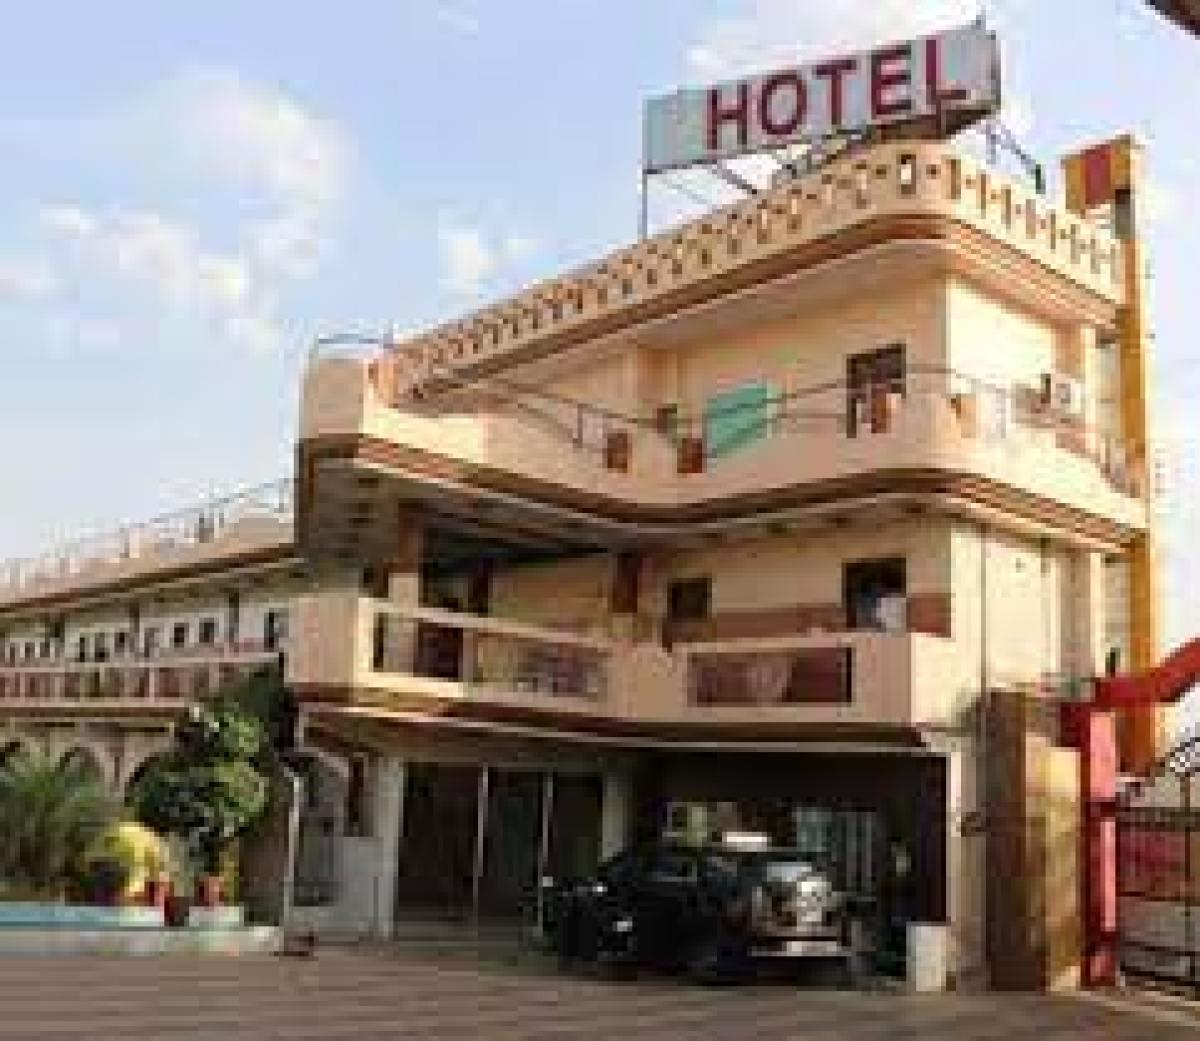 Sex, sex racket busted,Resort, The Royal Paradise Resorts & salt Yard, Ajmer –Beawar National Highway , sex trade, देह व्यापार, सेक्स रैकेट का भंडाफोड़,